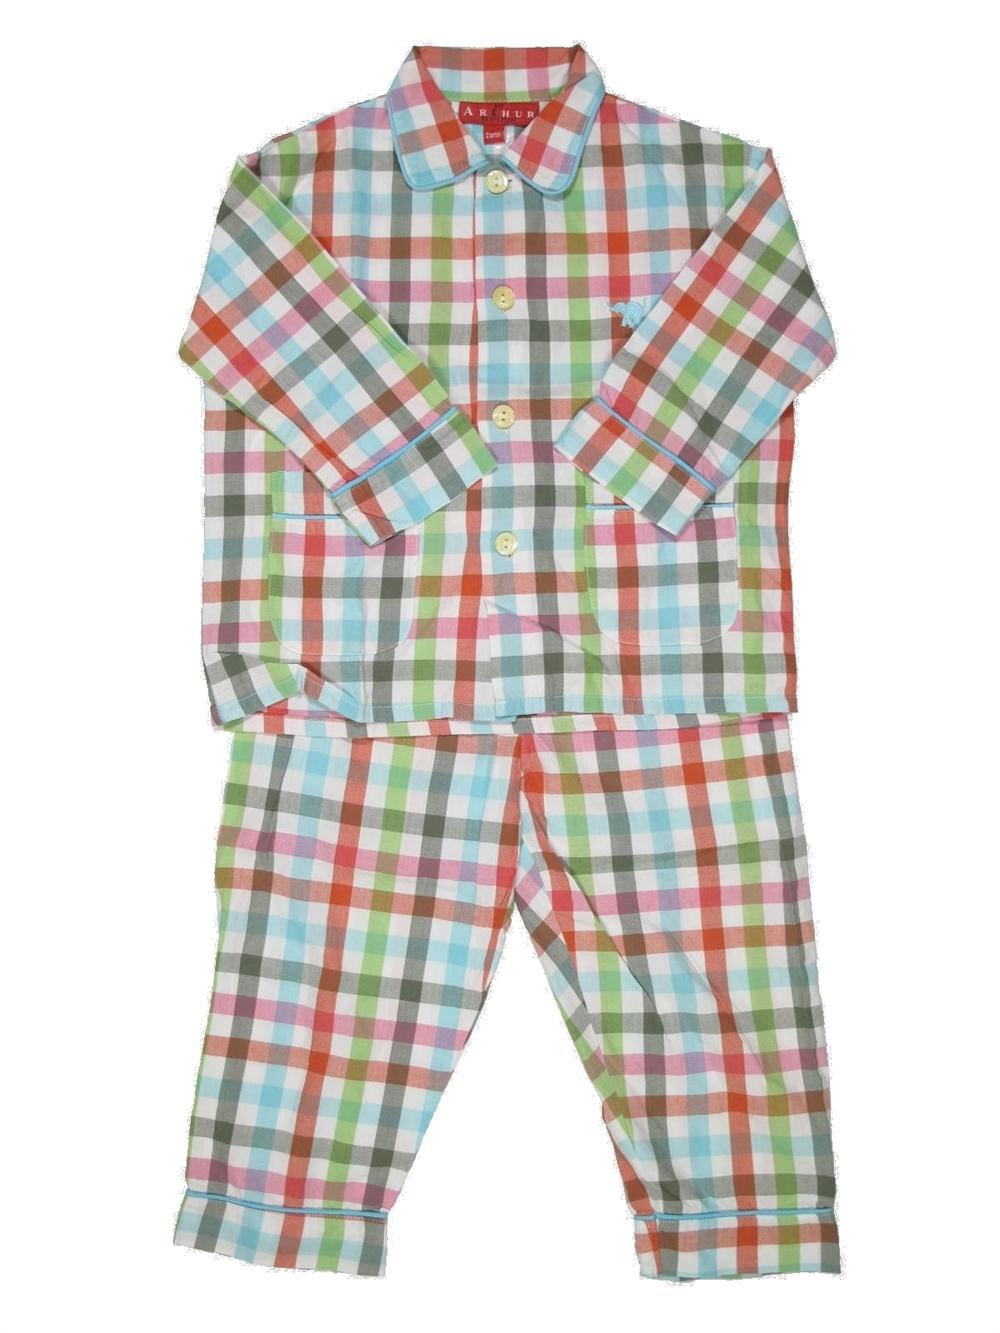 pyjama 2 pi ces garcon arthur 2 ans pas cher. Black Bedroom Furniture Sets. Home Design Ideas